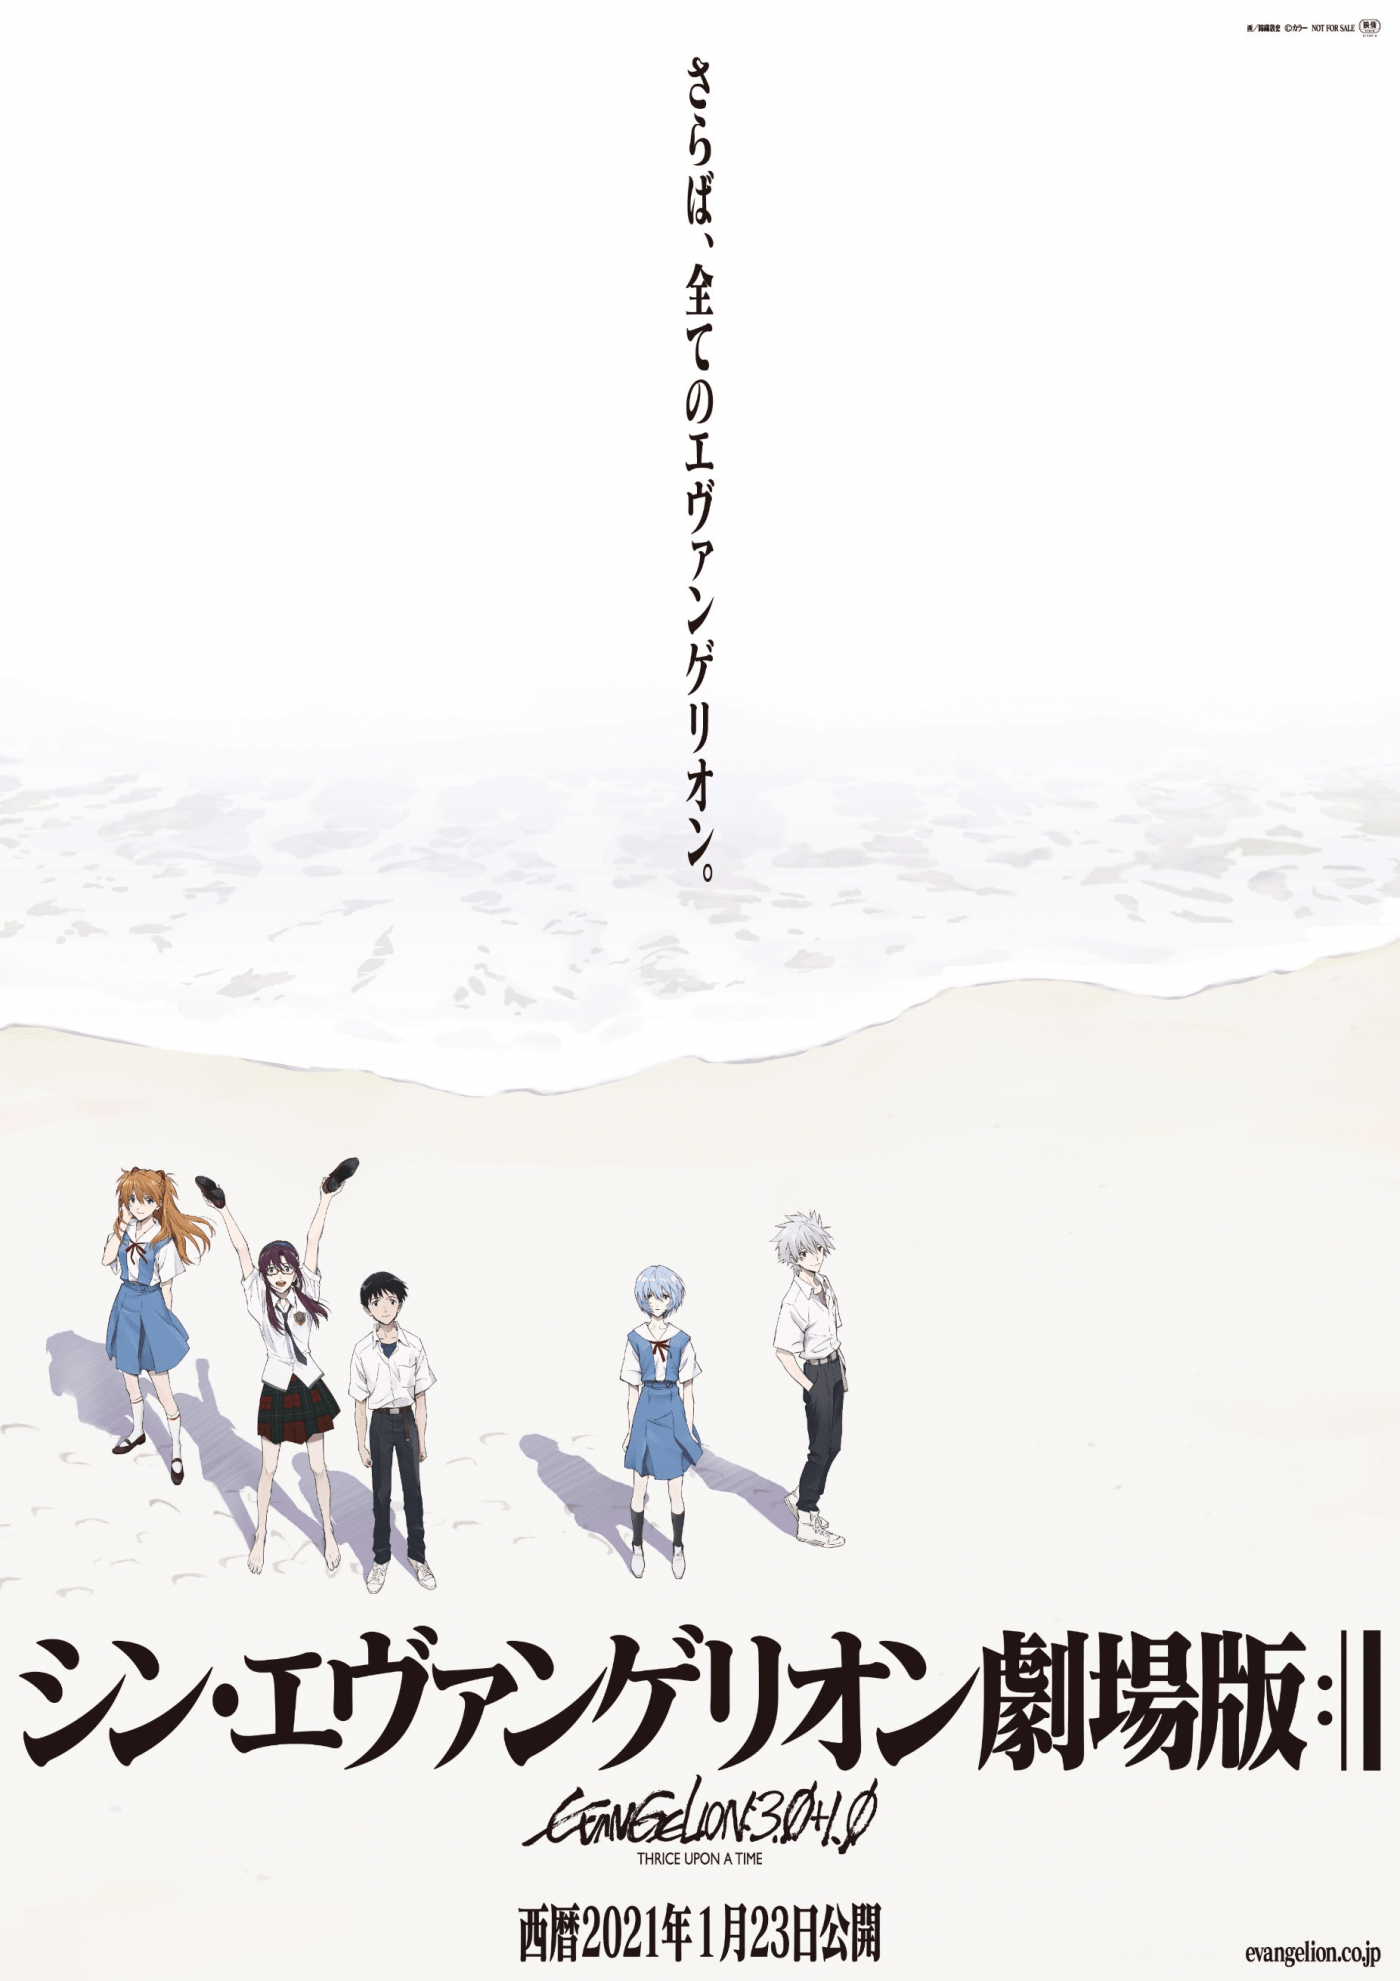 evangelion-4-poster